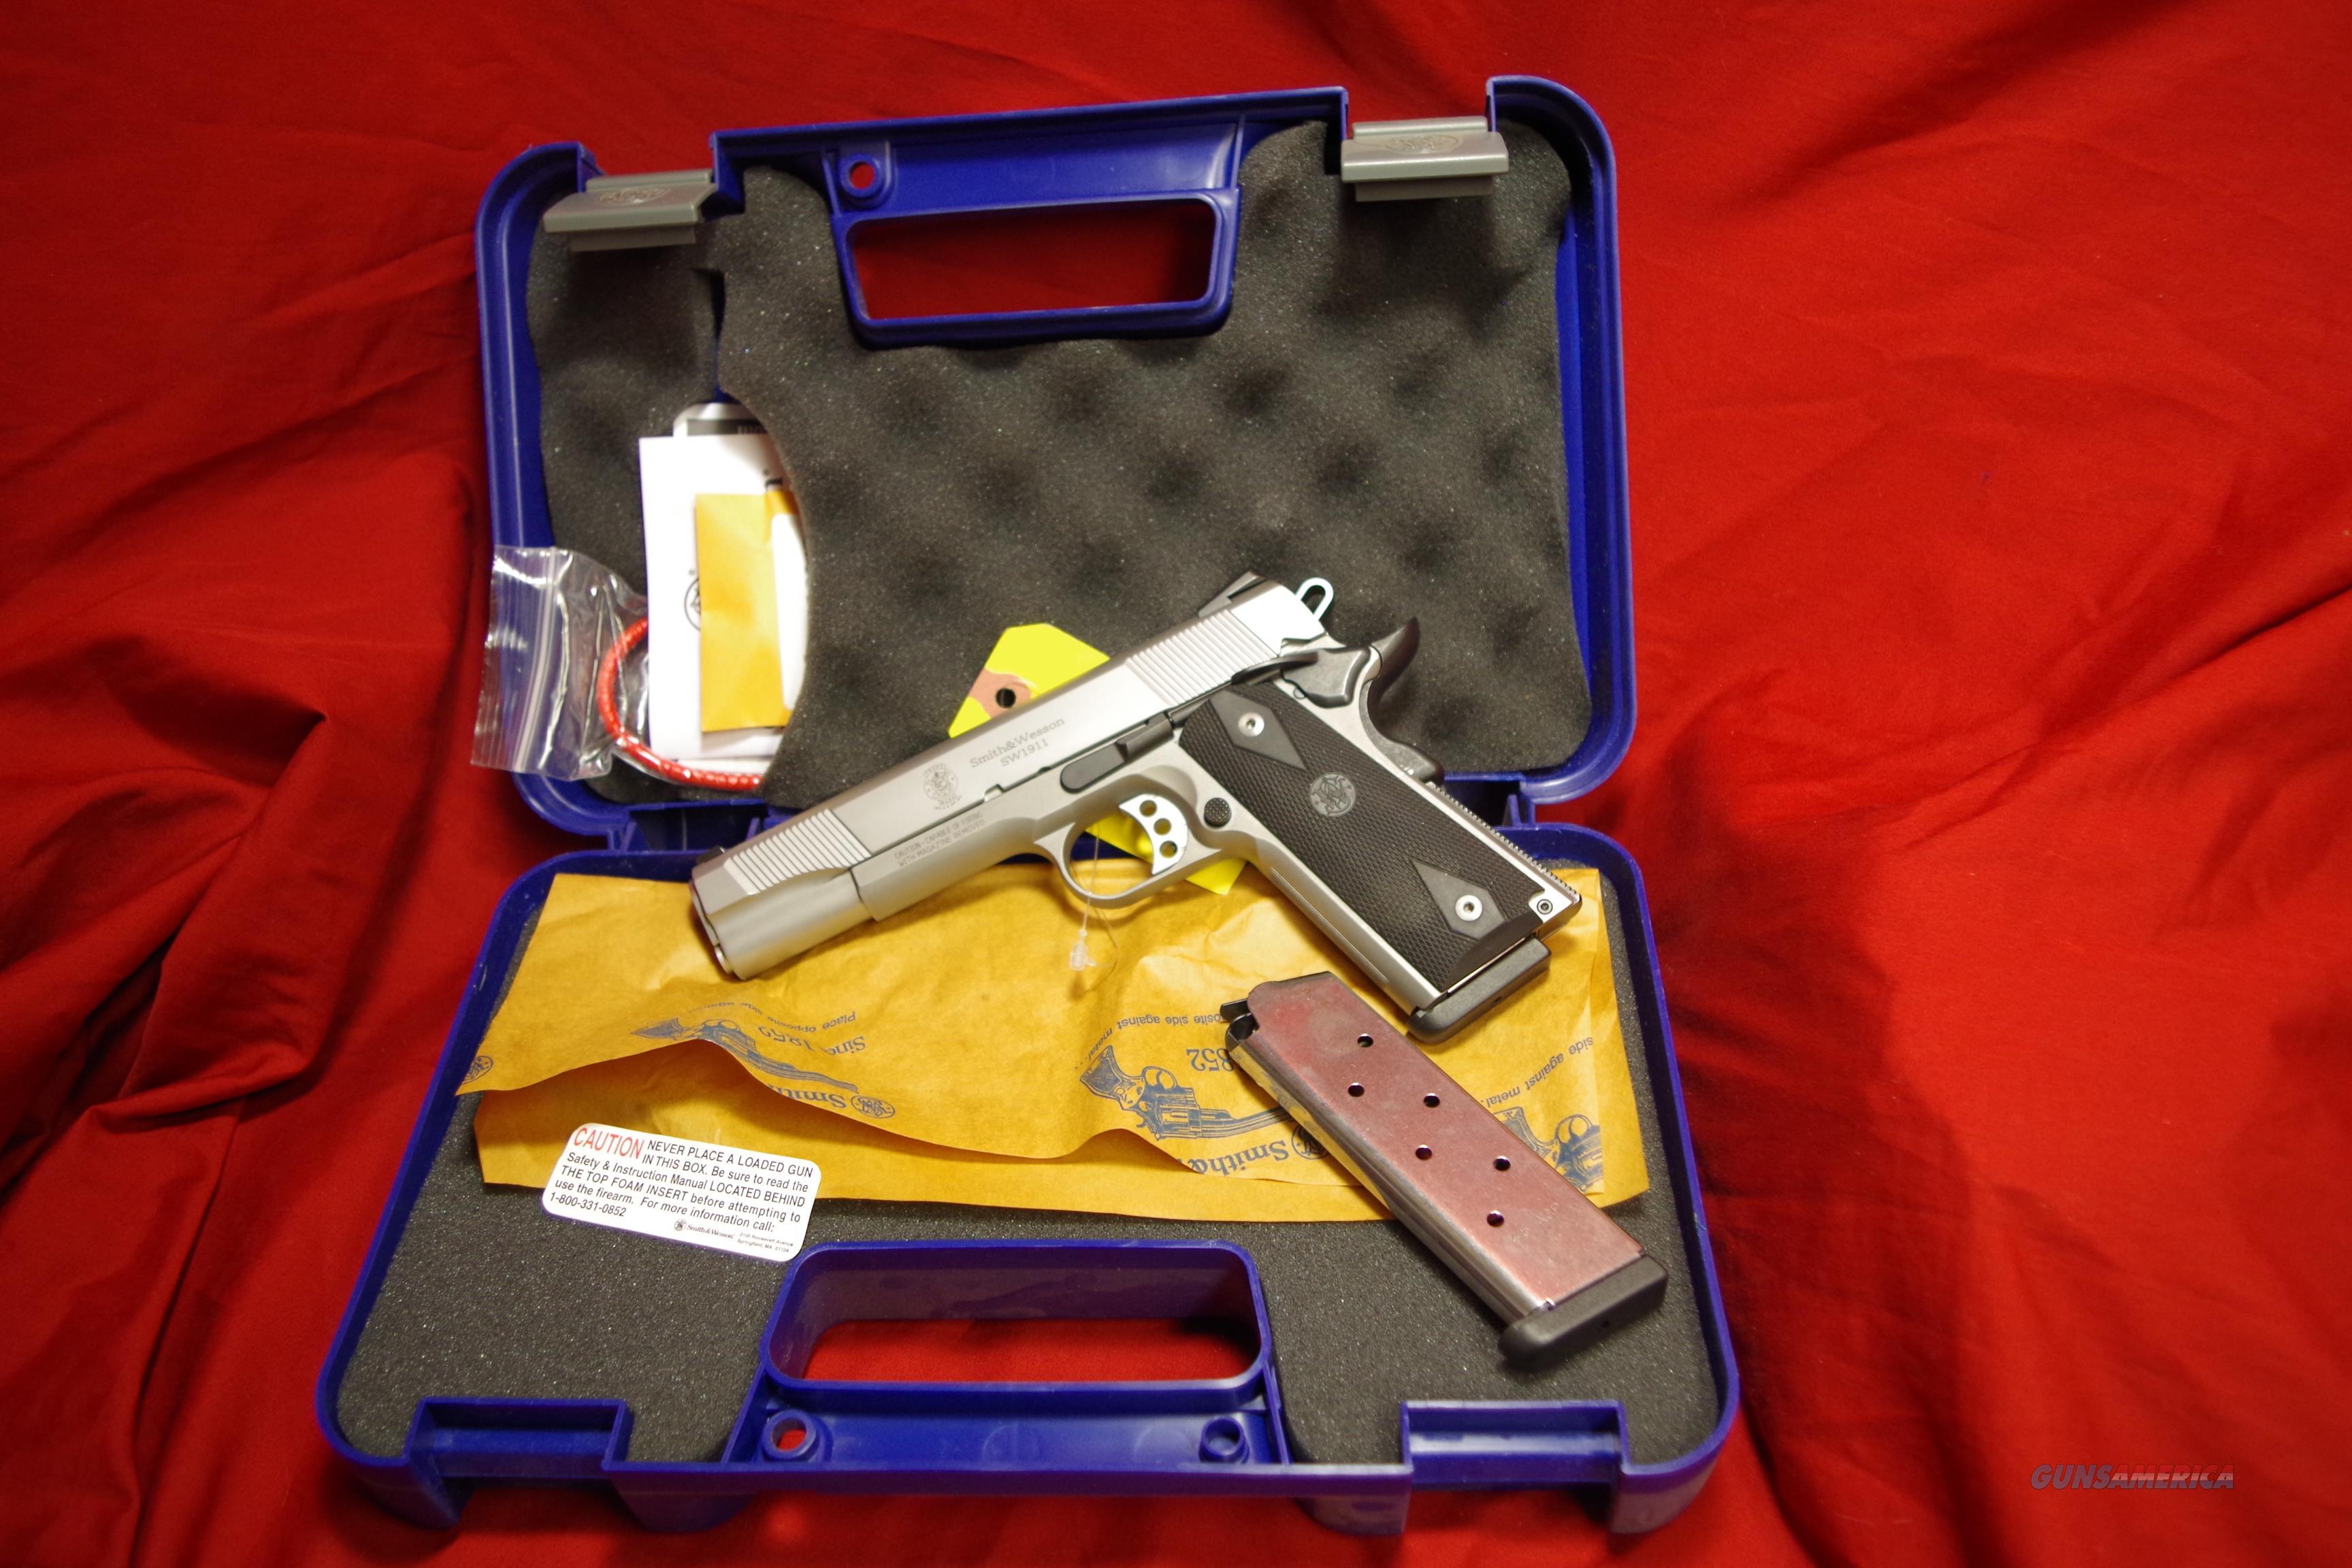 Smith & Wesson SW1911 45ACP  Guns > Pistols > Smith & Wesson Pistols - Autos > Steel Frame